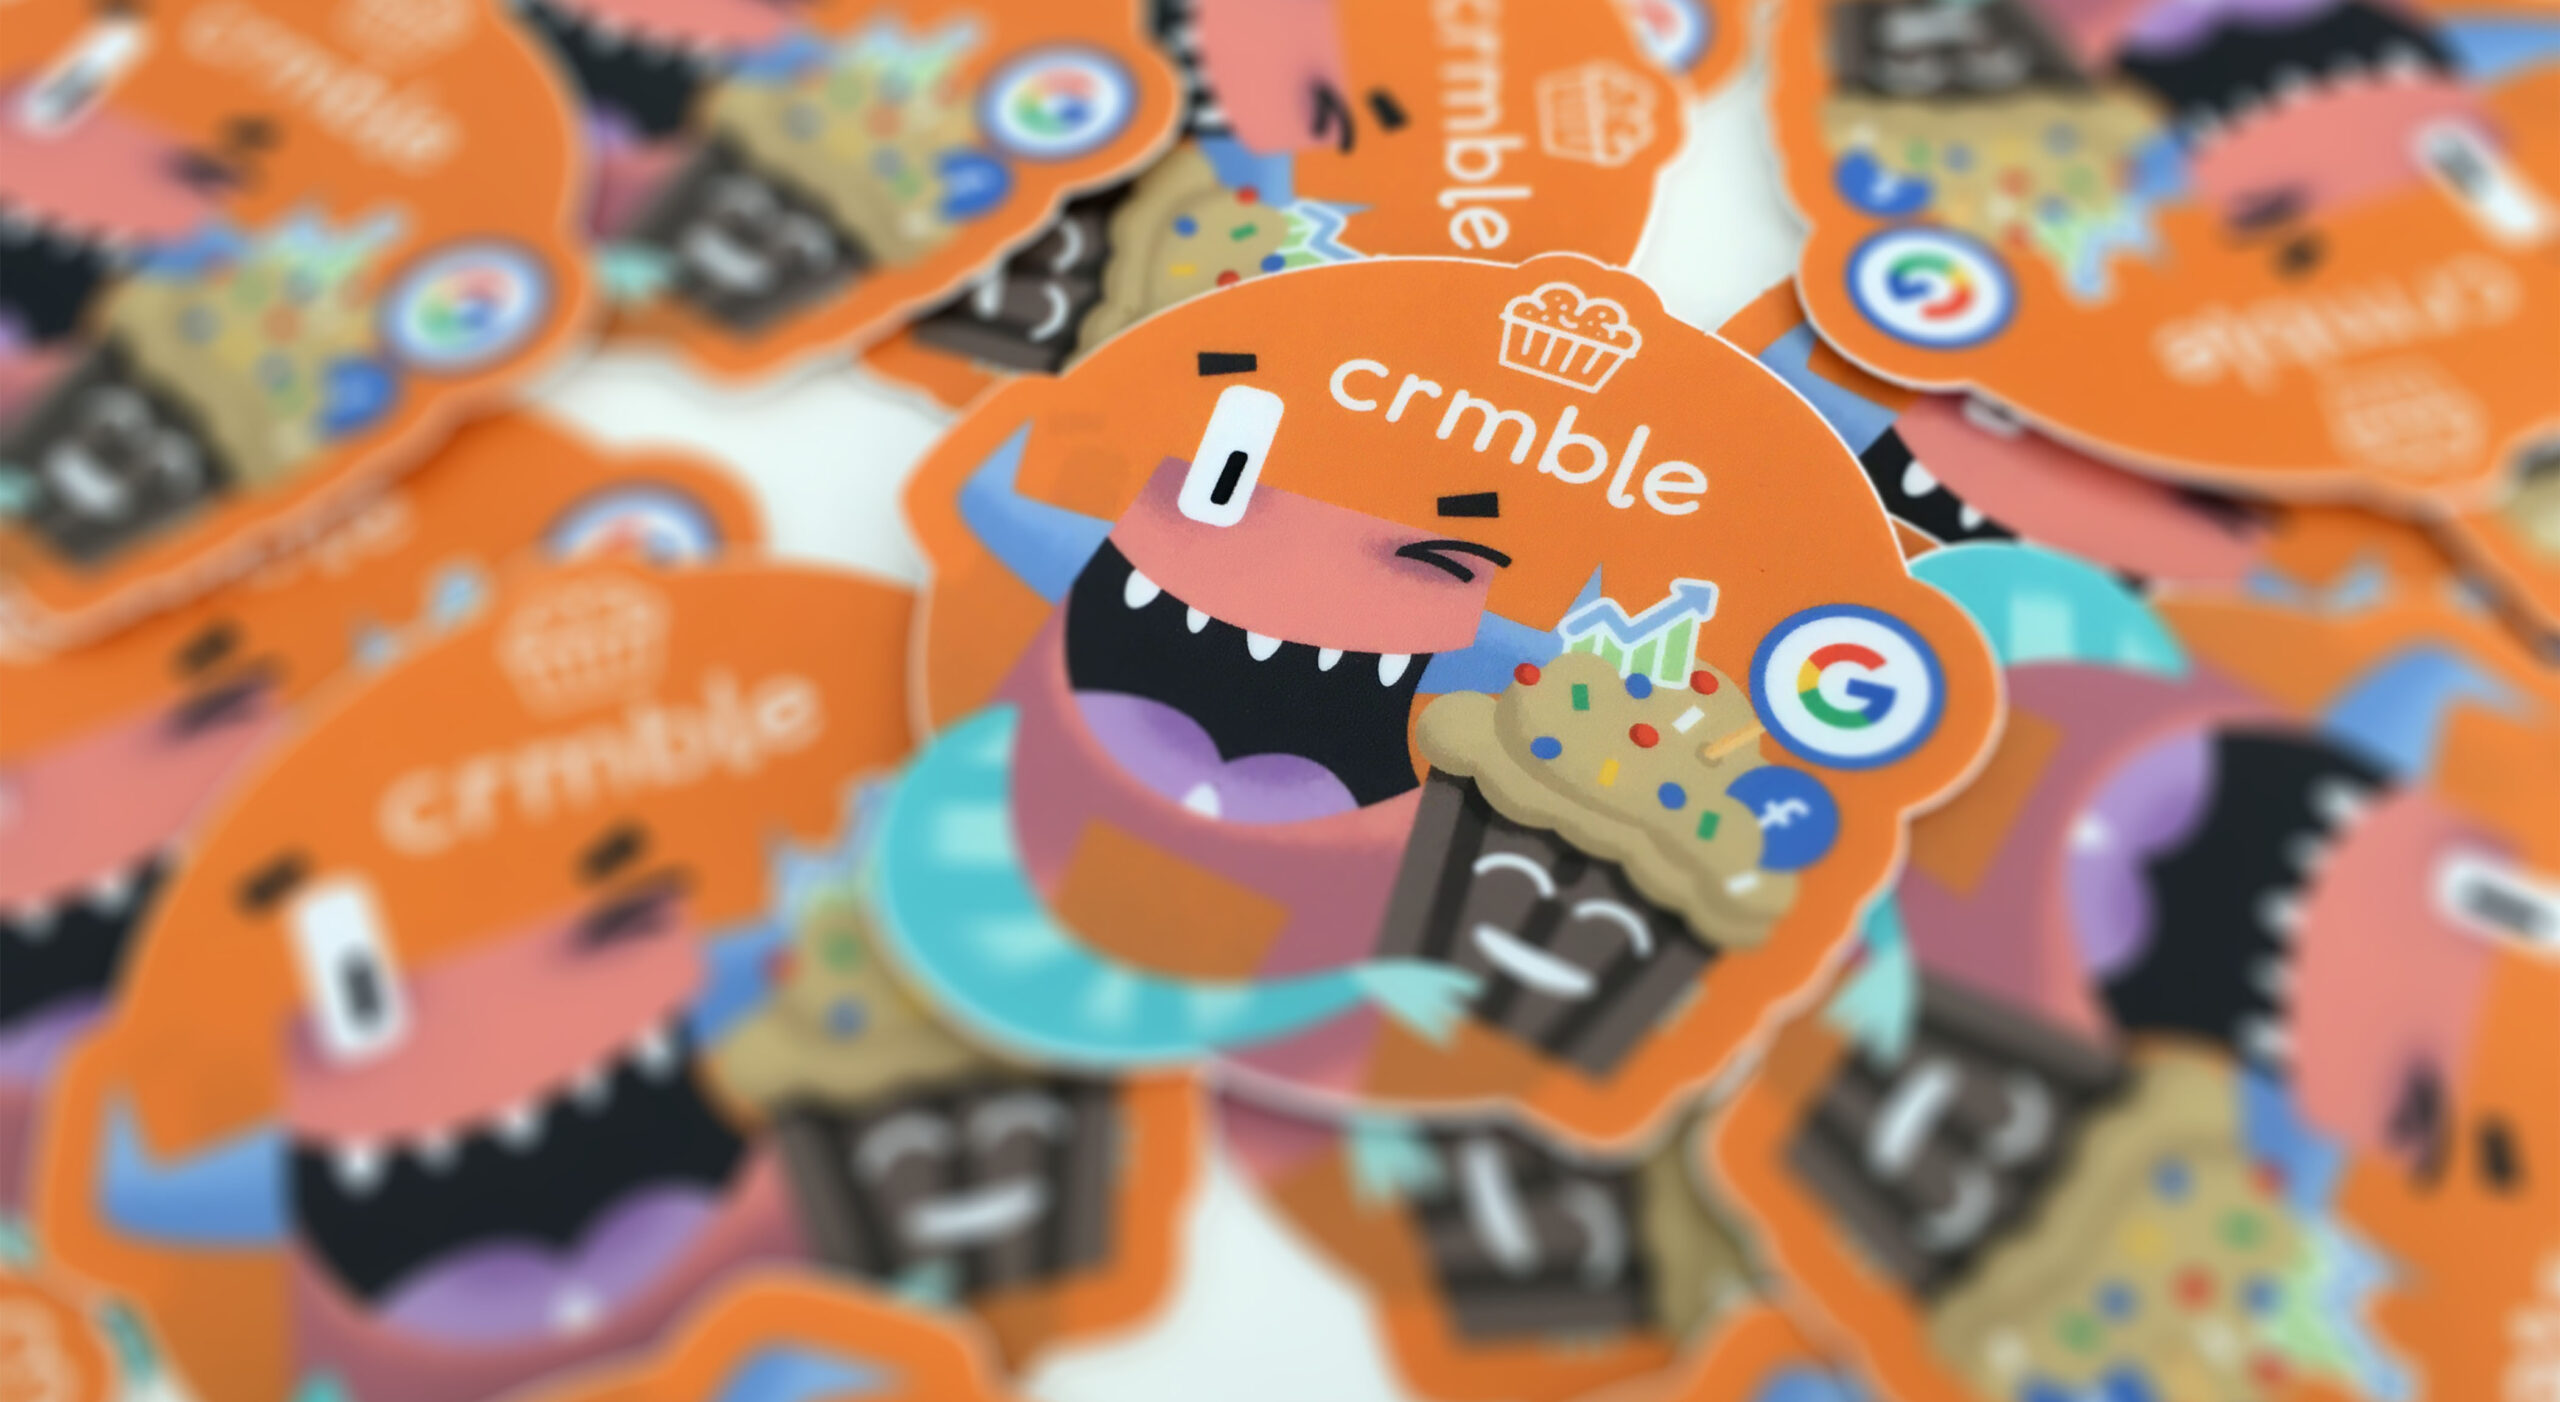 Crmble sticker order board background